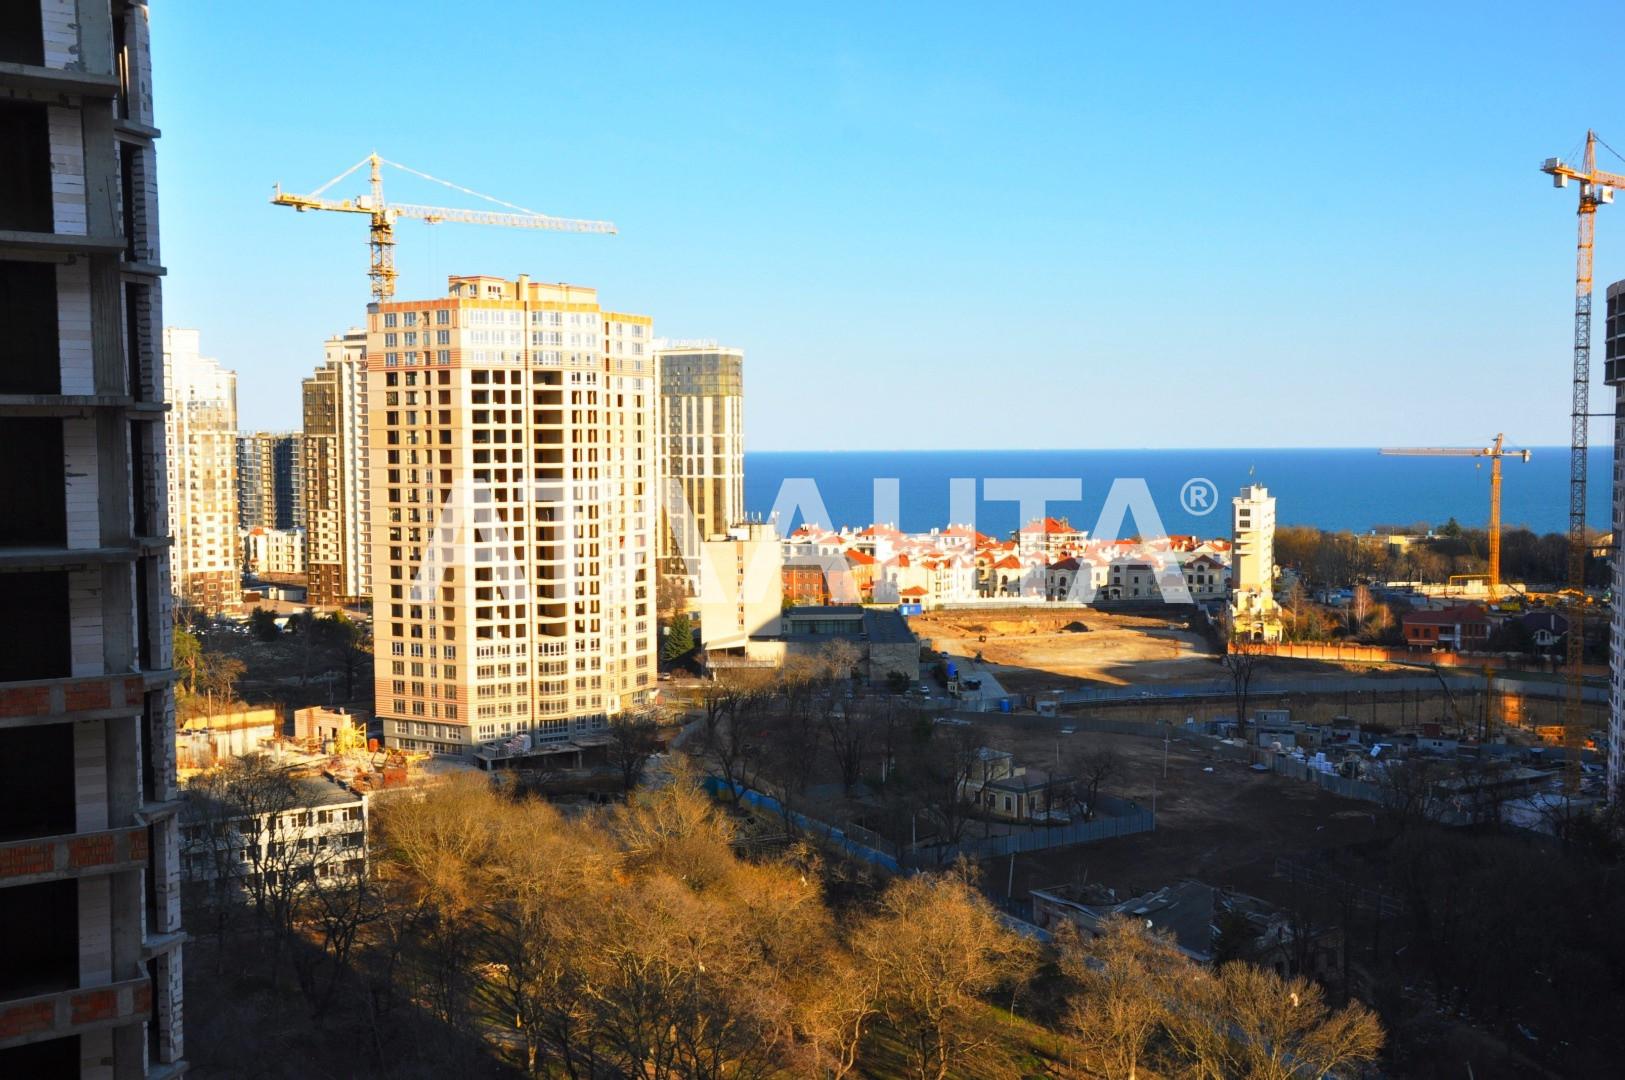 Продается 2-комнатная Квартира на ул. Генуэзская — 68 100 у.е.